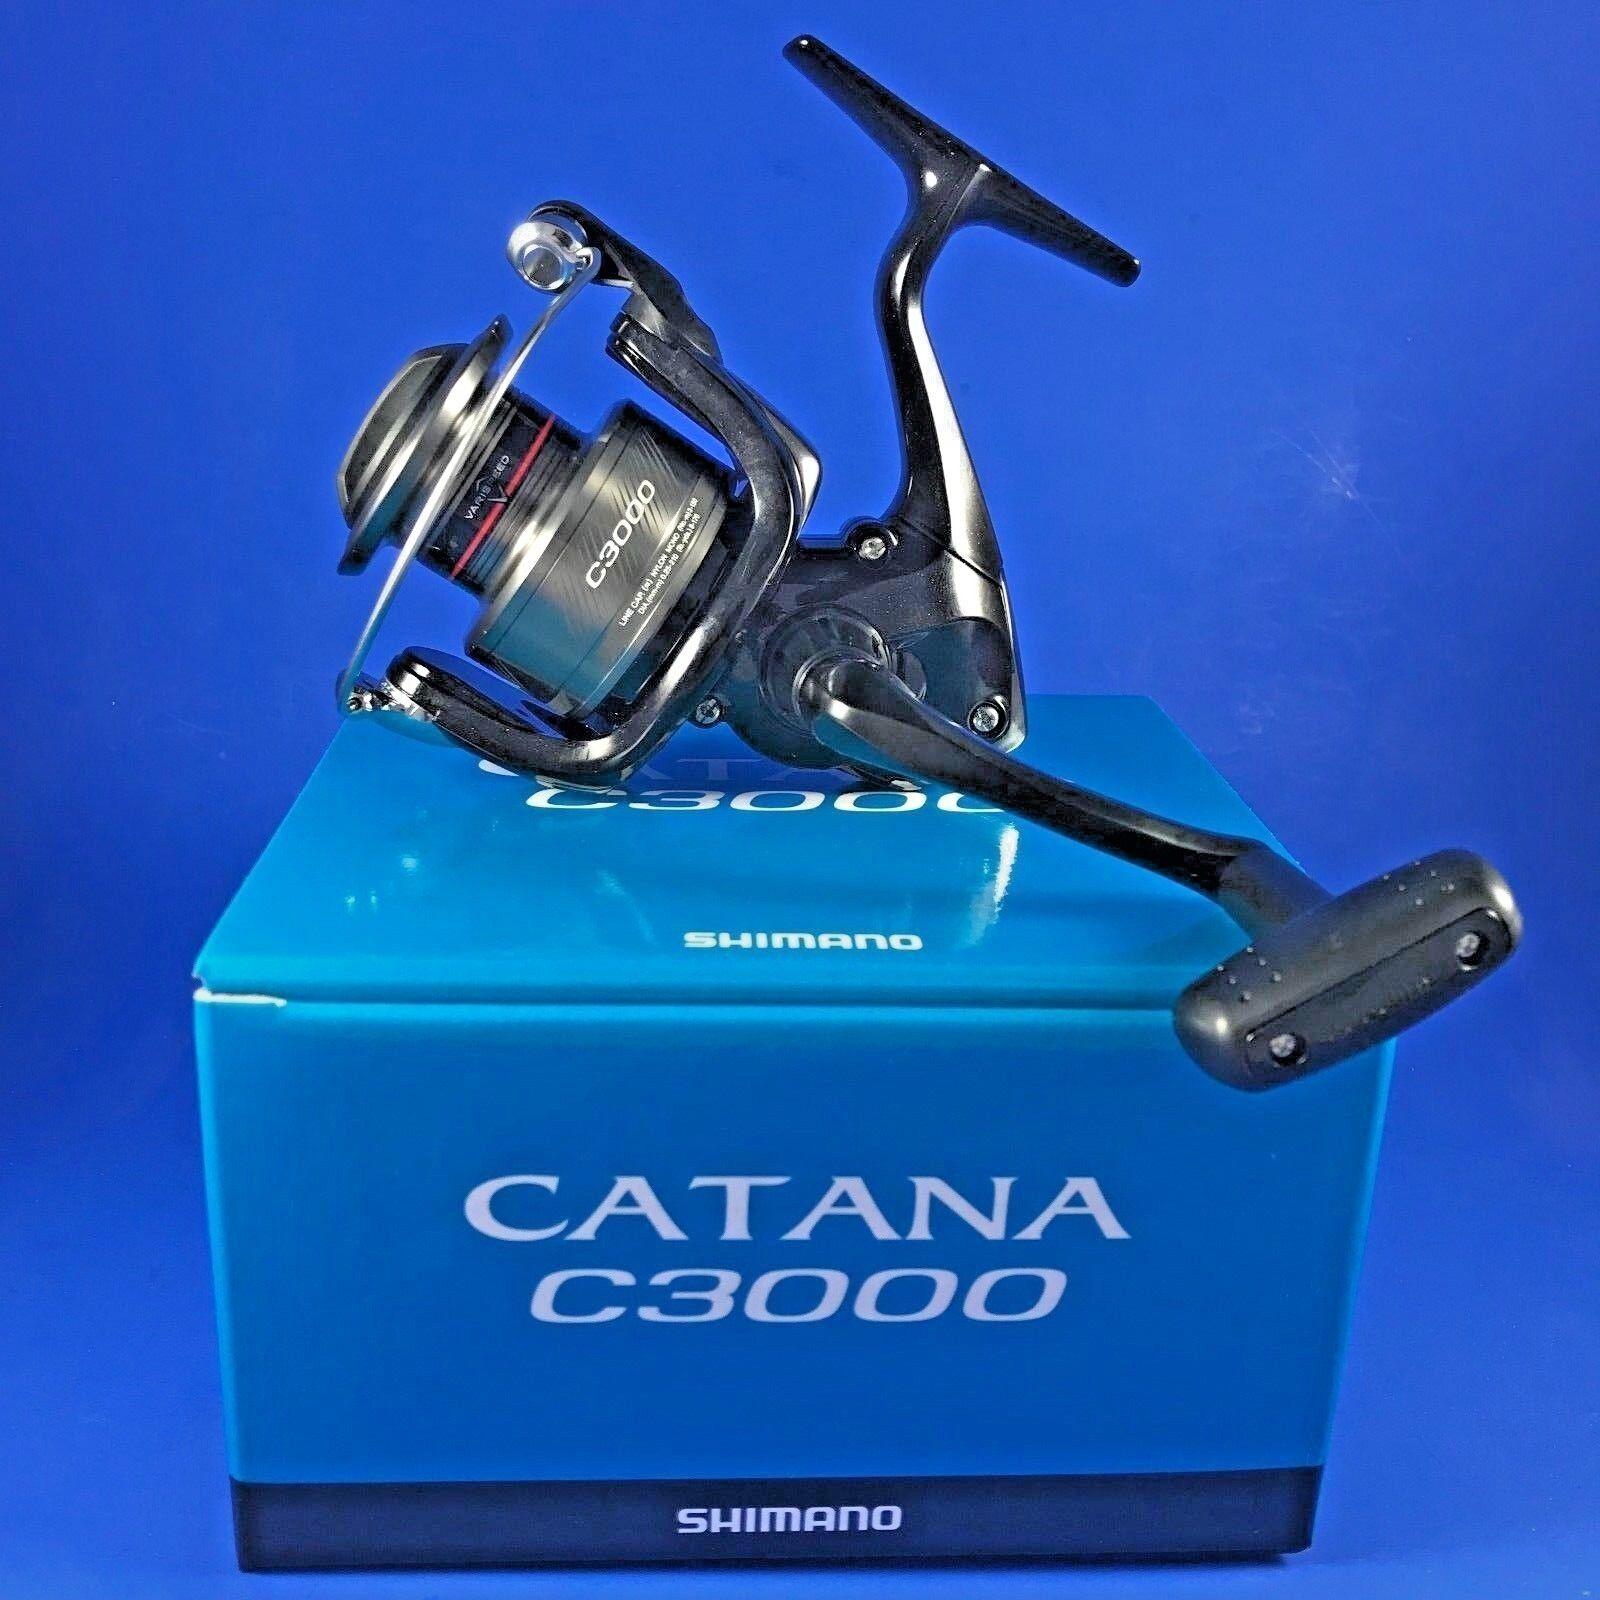 Shimano Catana C3000 FD CATC3000FD // CATC3000FD FD // Front Drag Fishing Reel a79f48